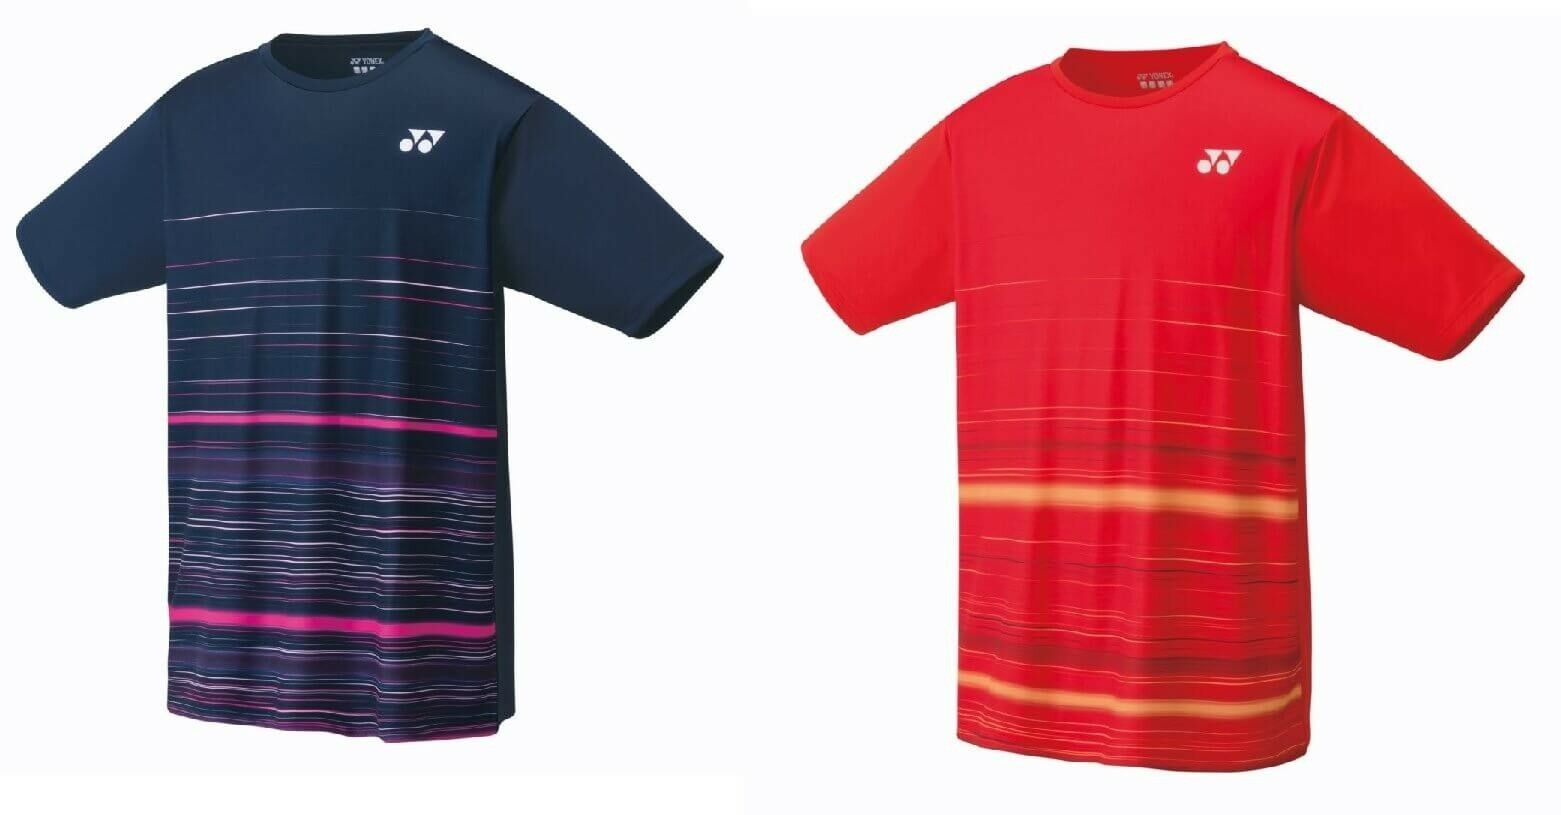 Yonex Maglietta 16368 Badminton Ping-Pong Maglietta